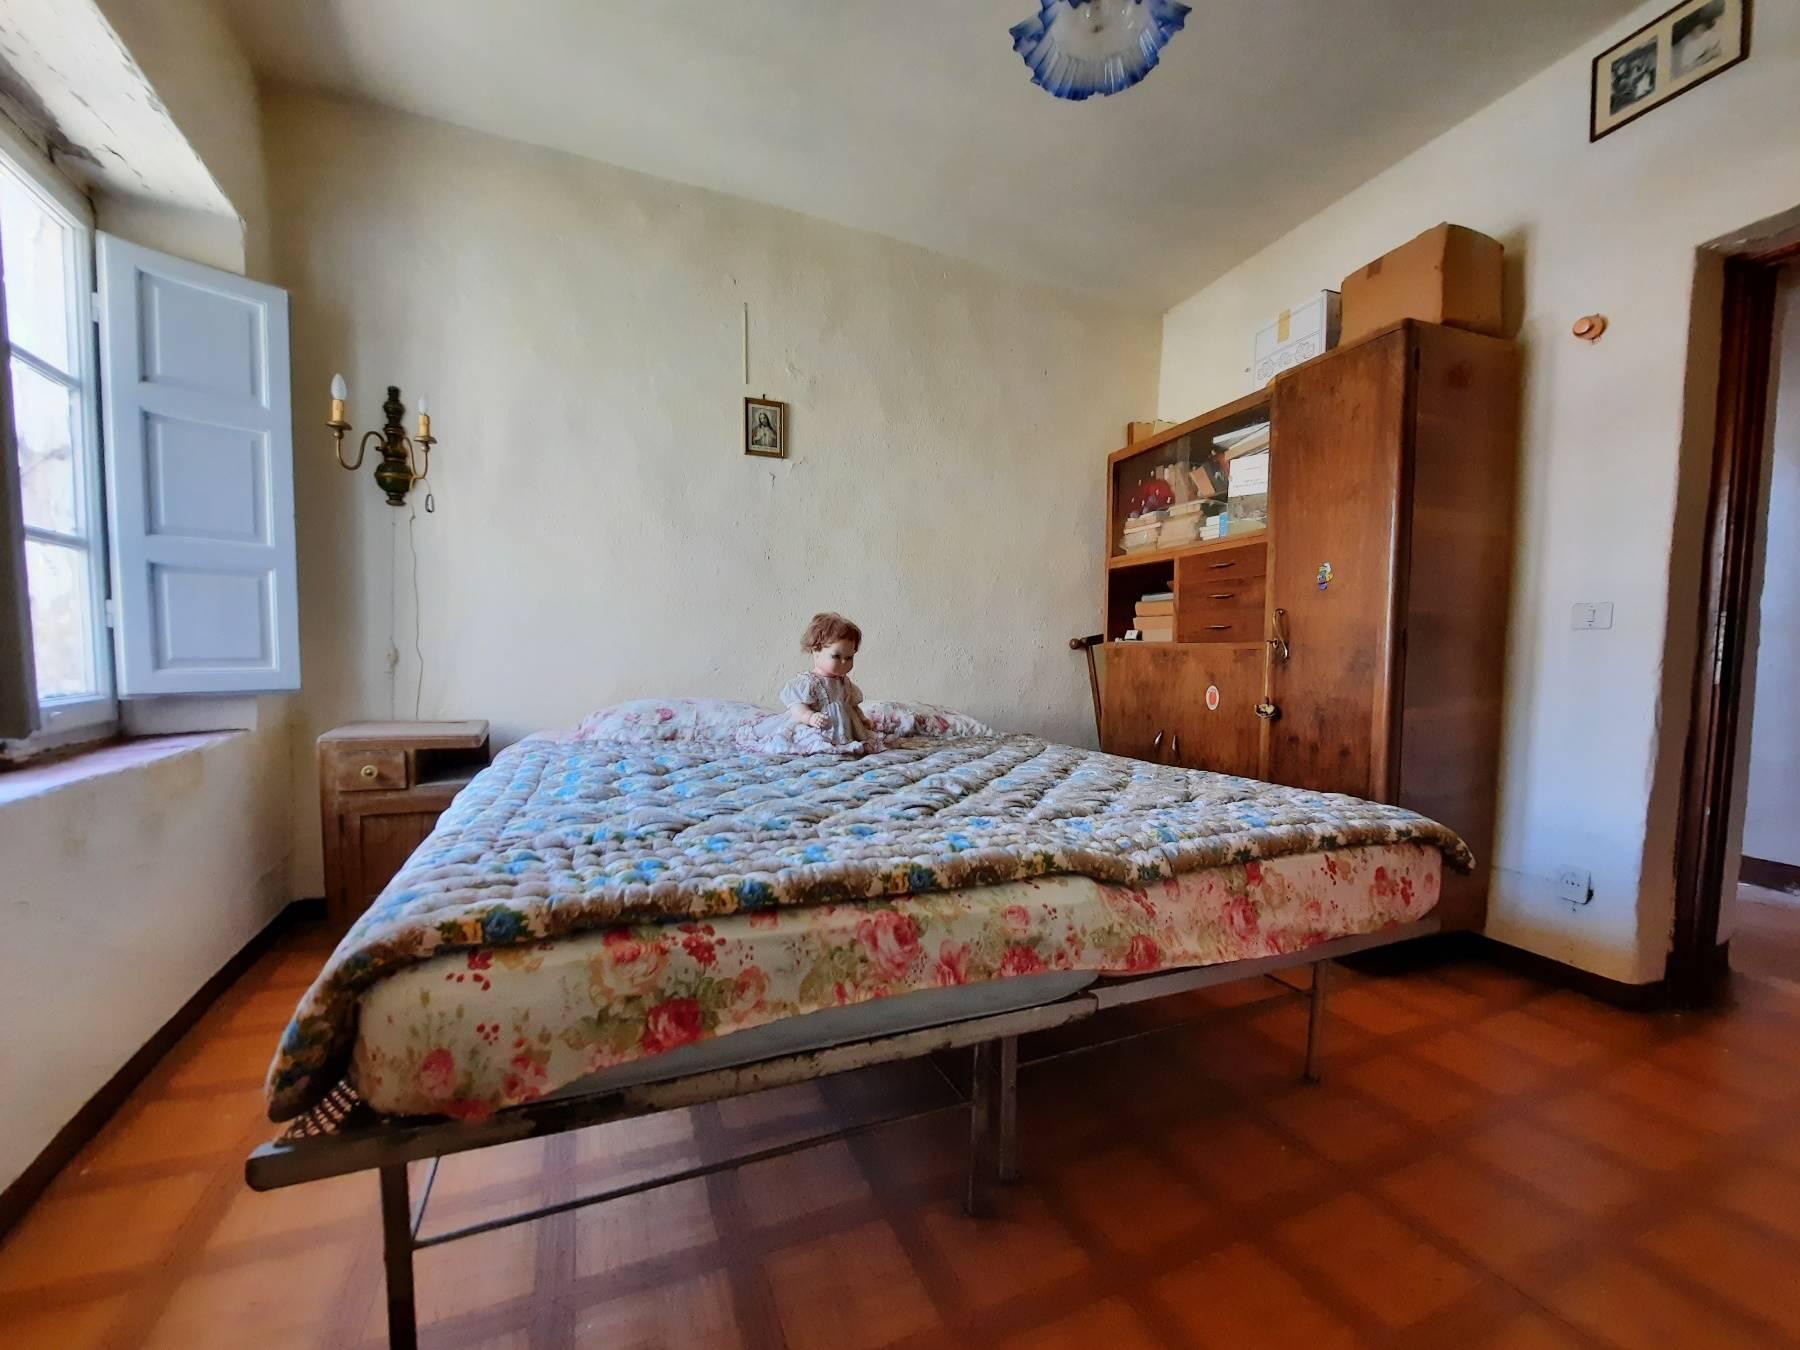 La camera 3 - The bedroom 3